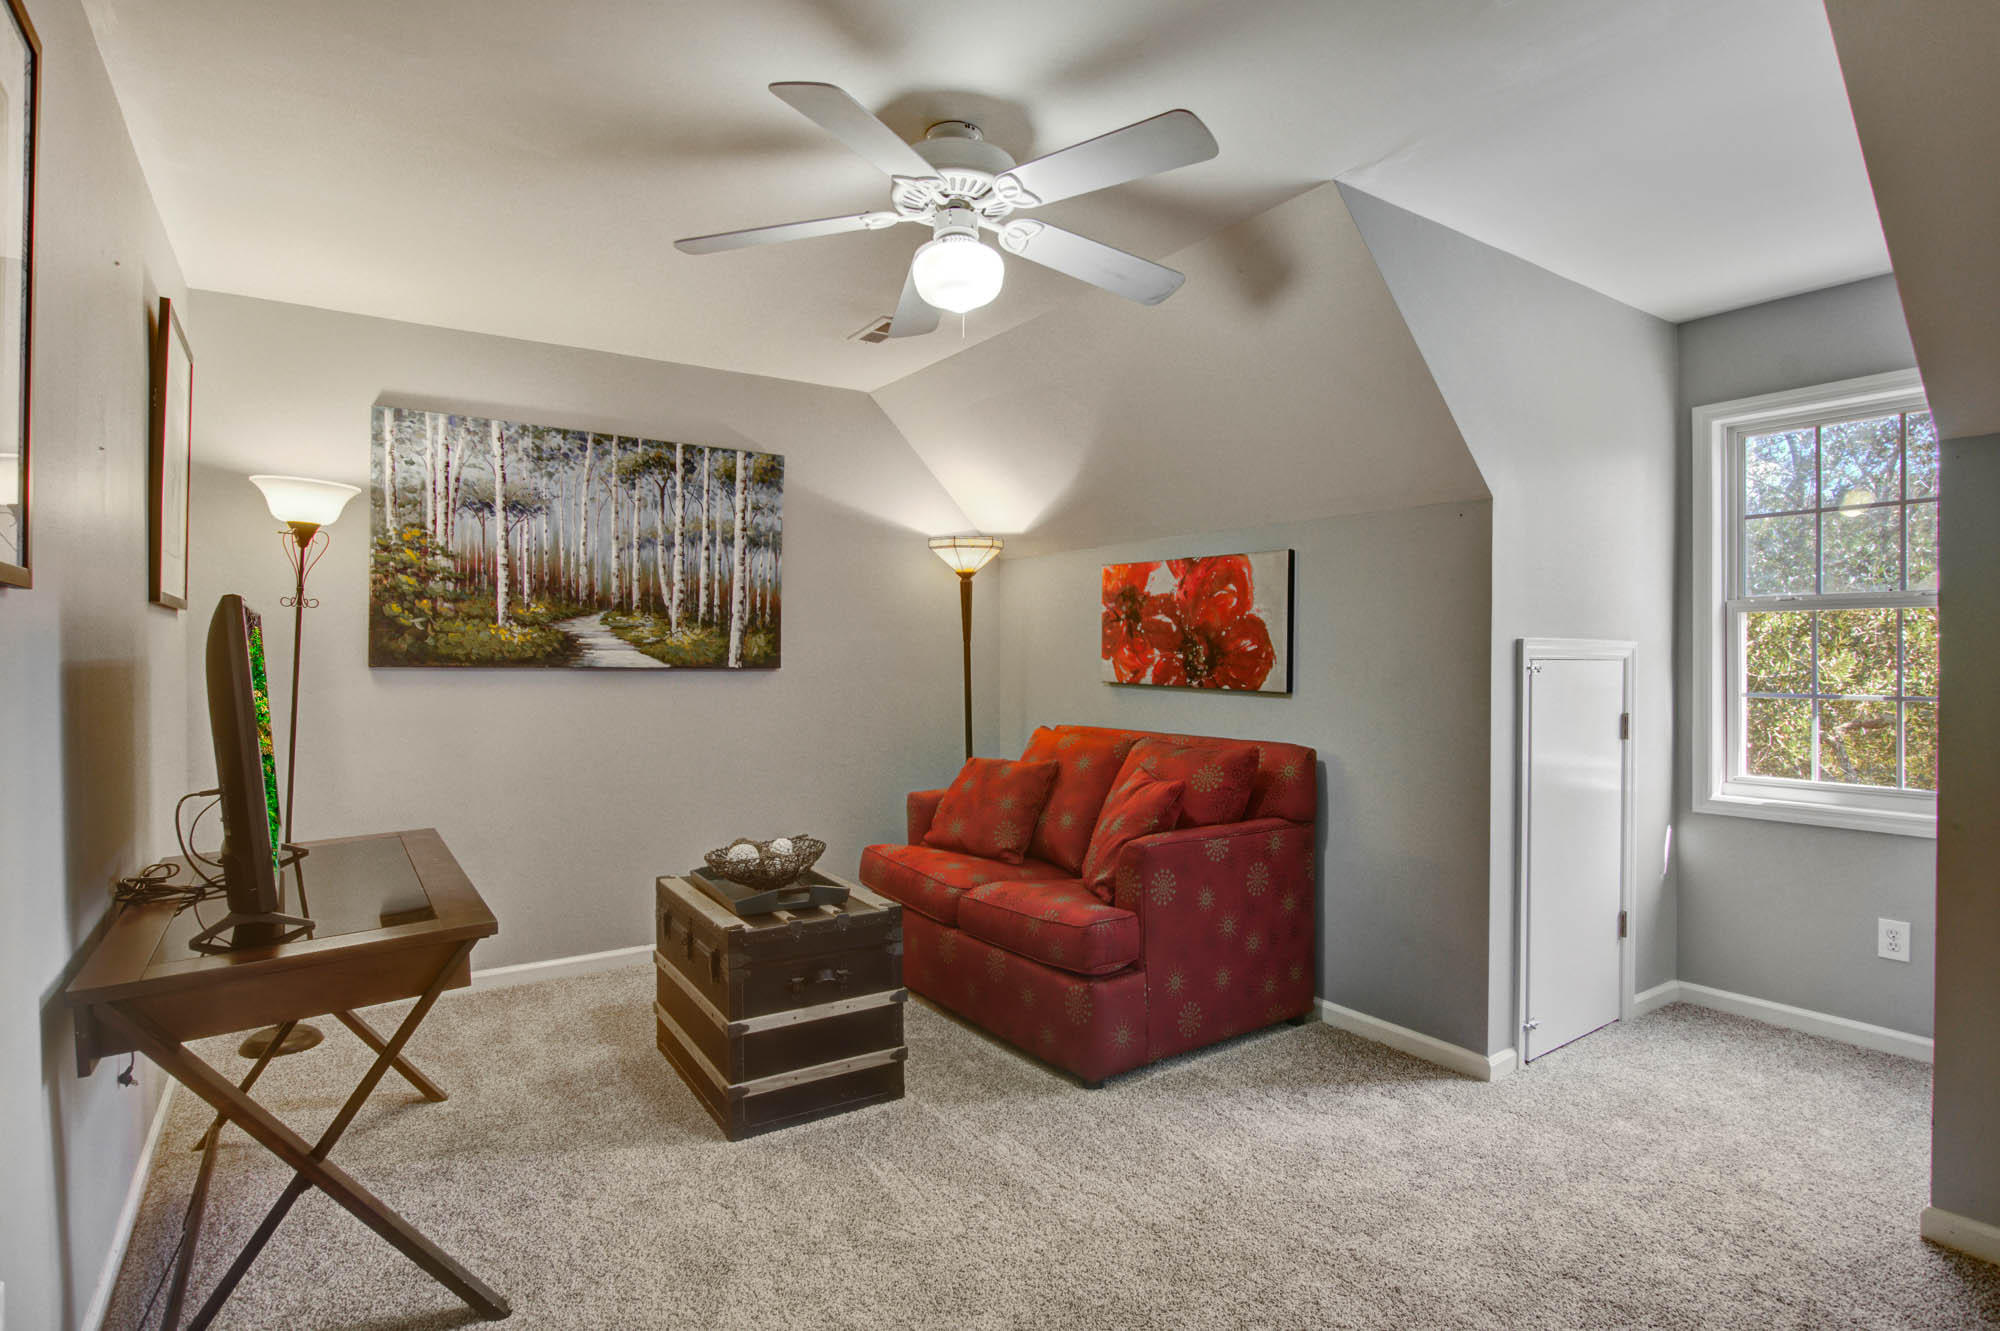 St Thomas Point Homes For Sale - 307 Jamesbury, Charleston, SC - 18